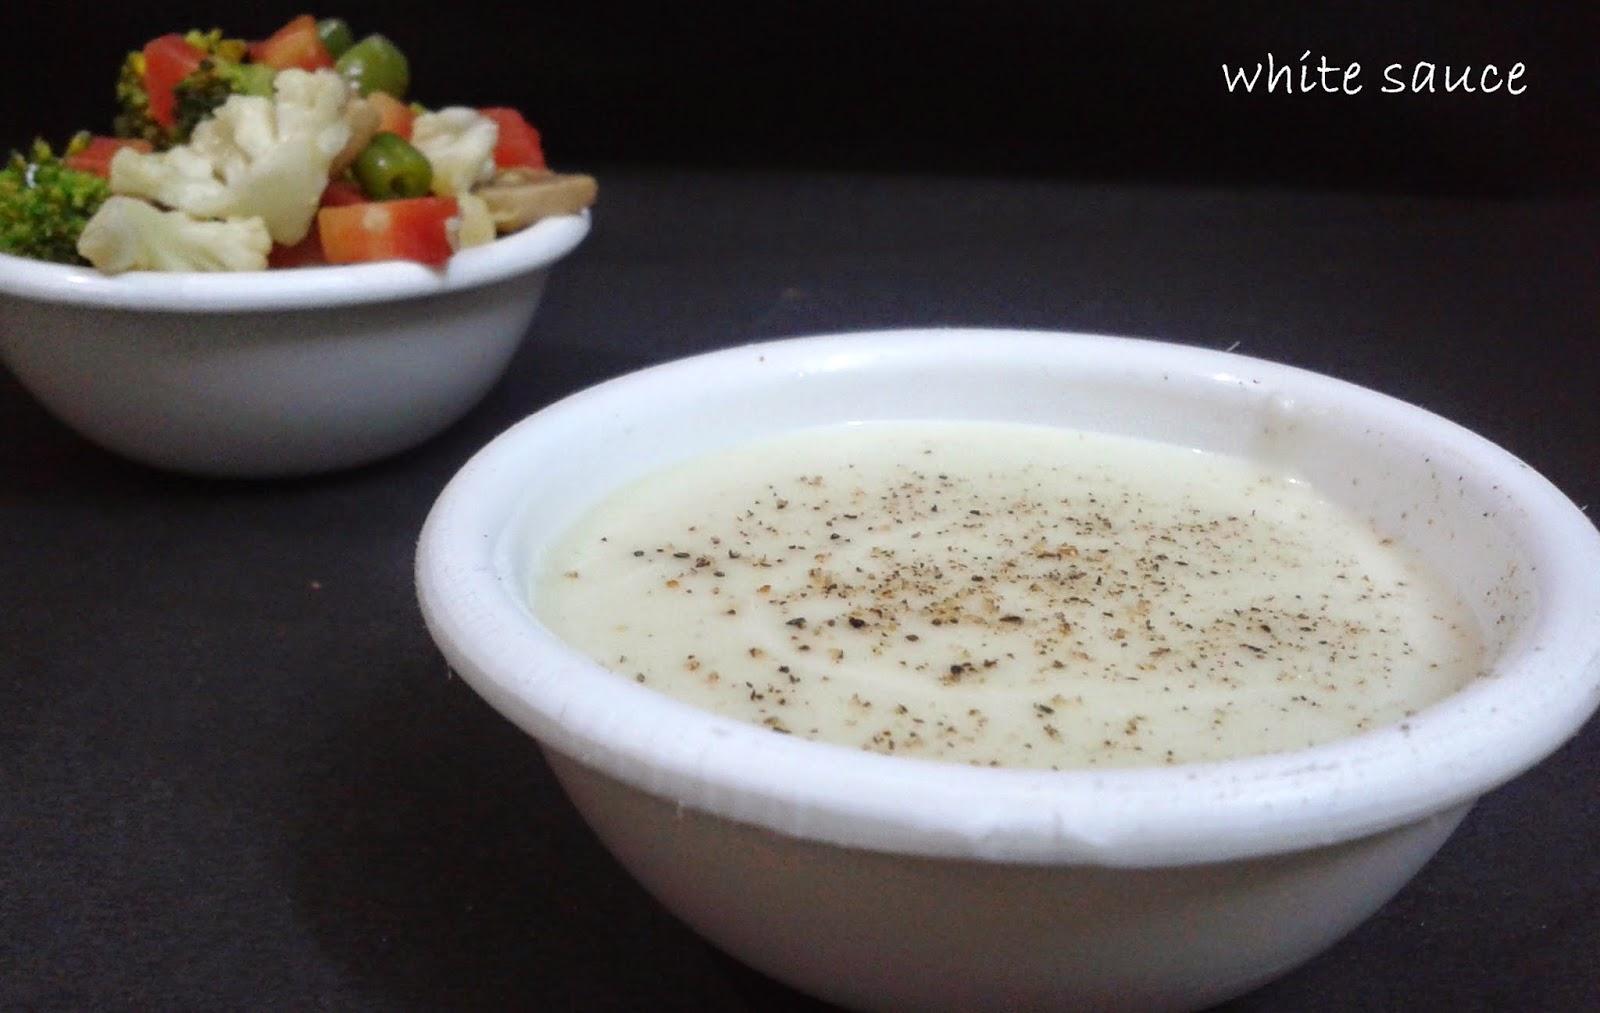 http://paakvidhi.blogspot.in/2014/01/white-sauce.html